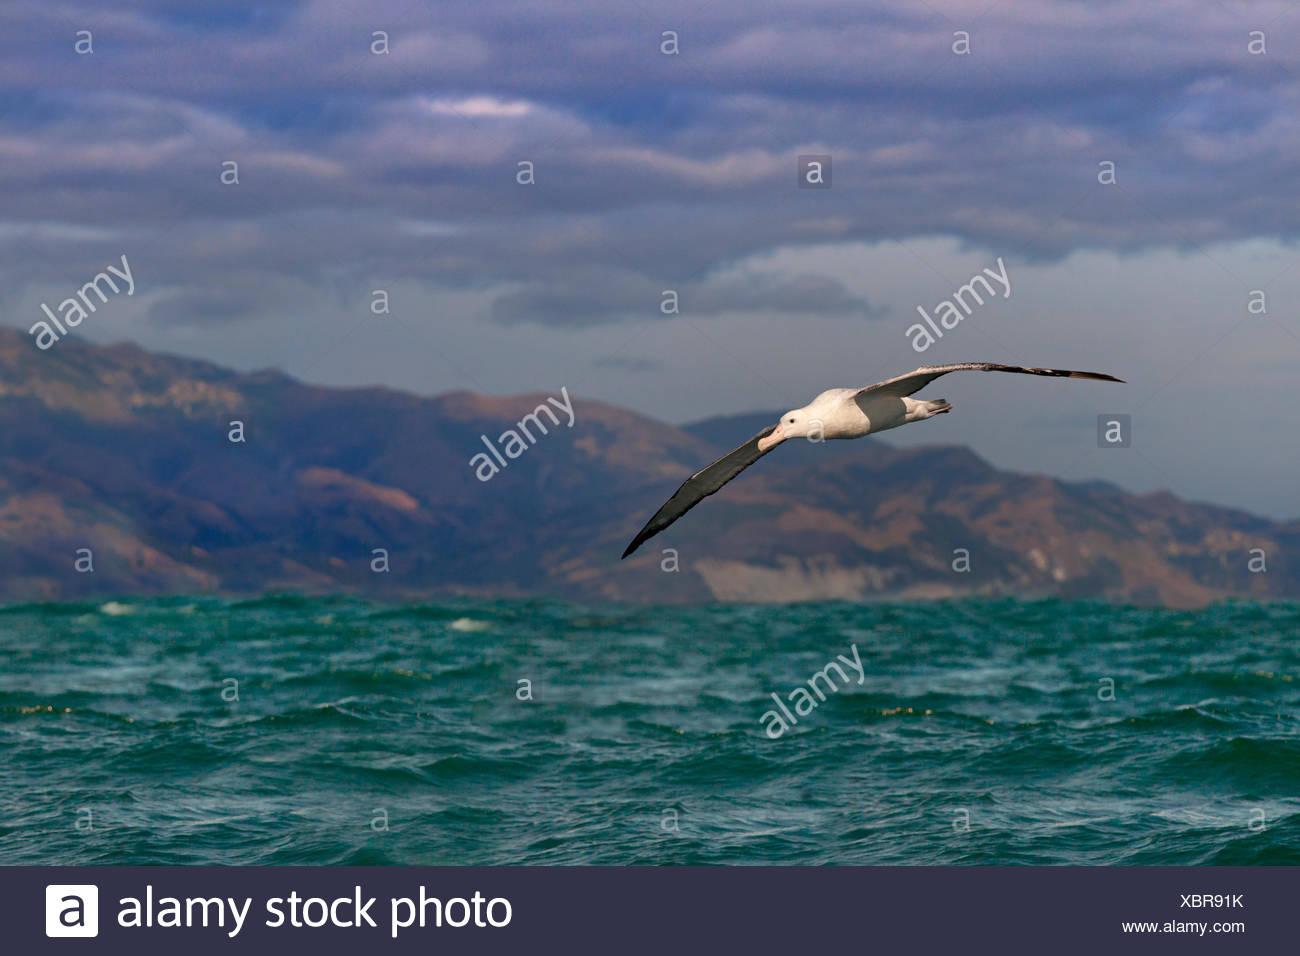 Wandering albatross (Diomedea exulans) in flight, Kaikoura, New Zealand - Stock Image